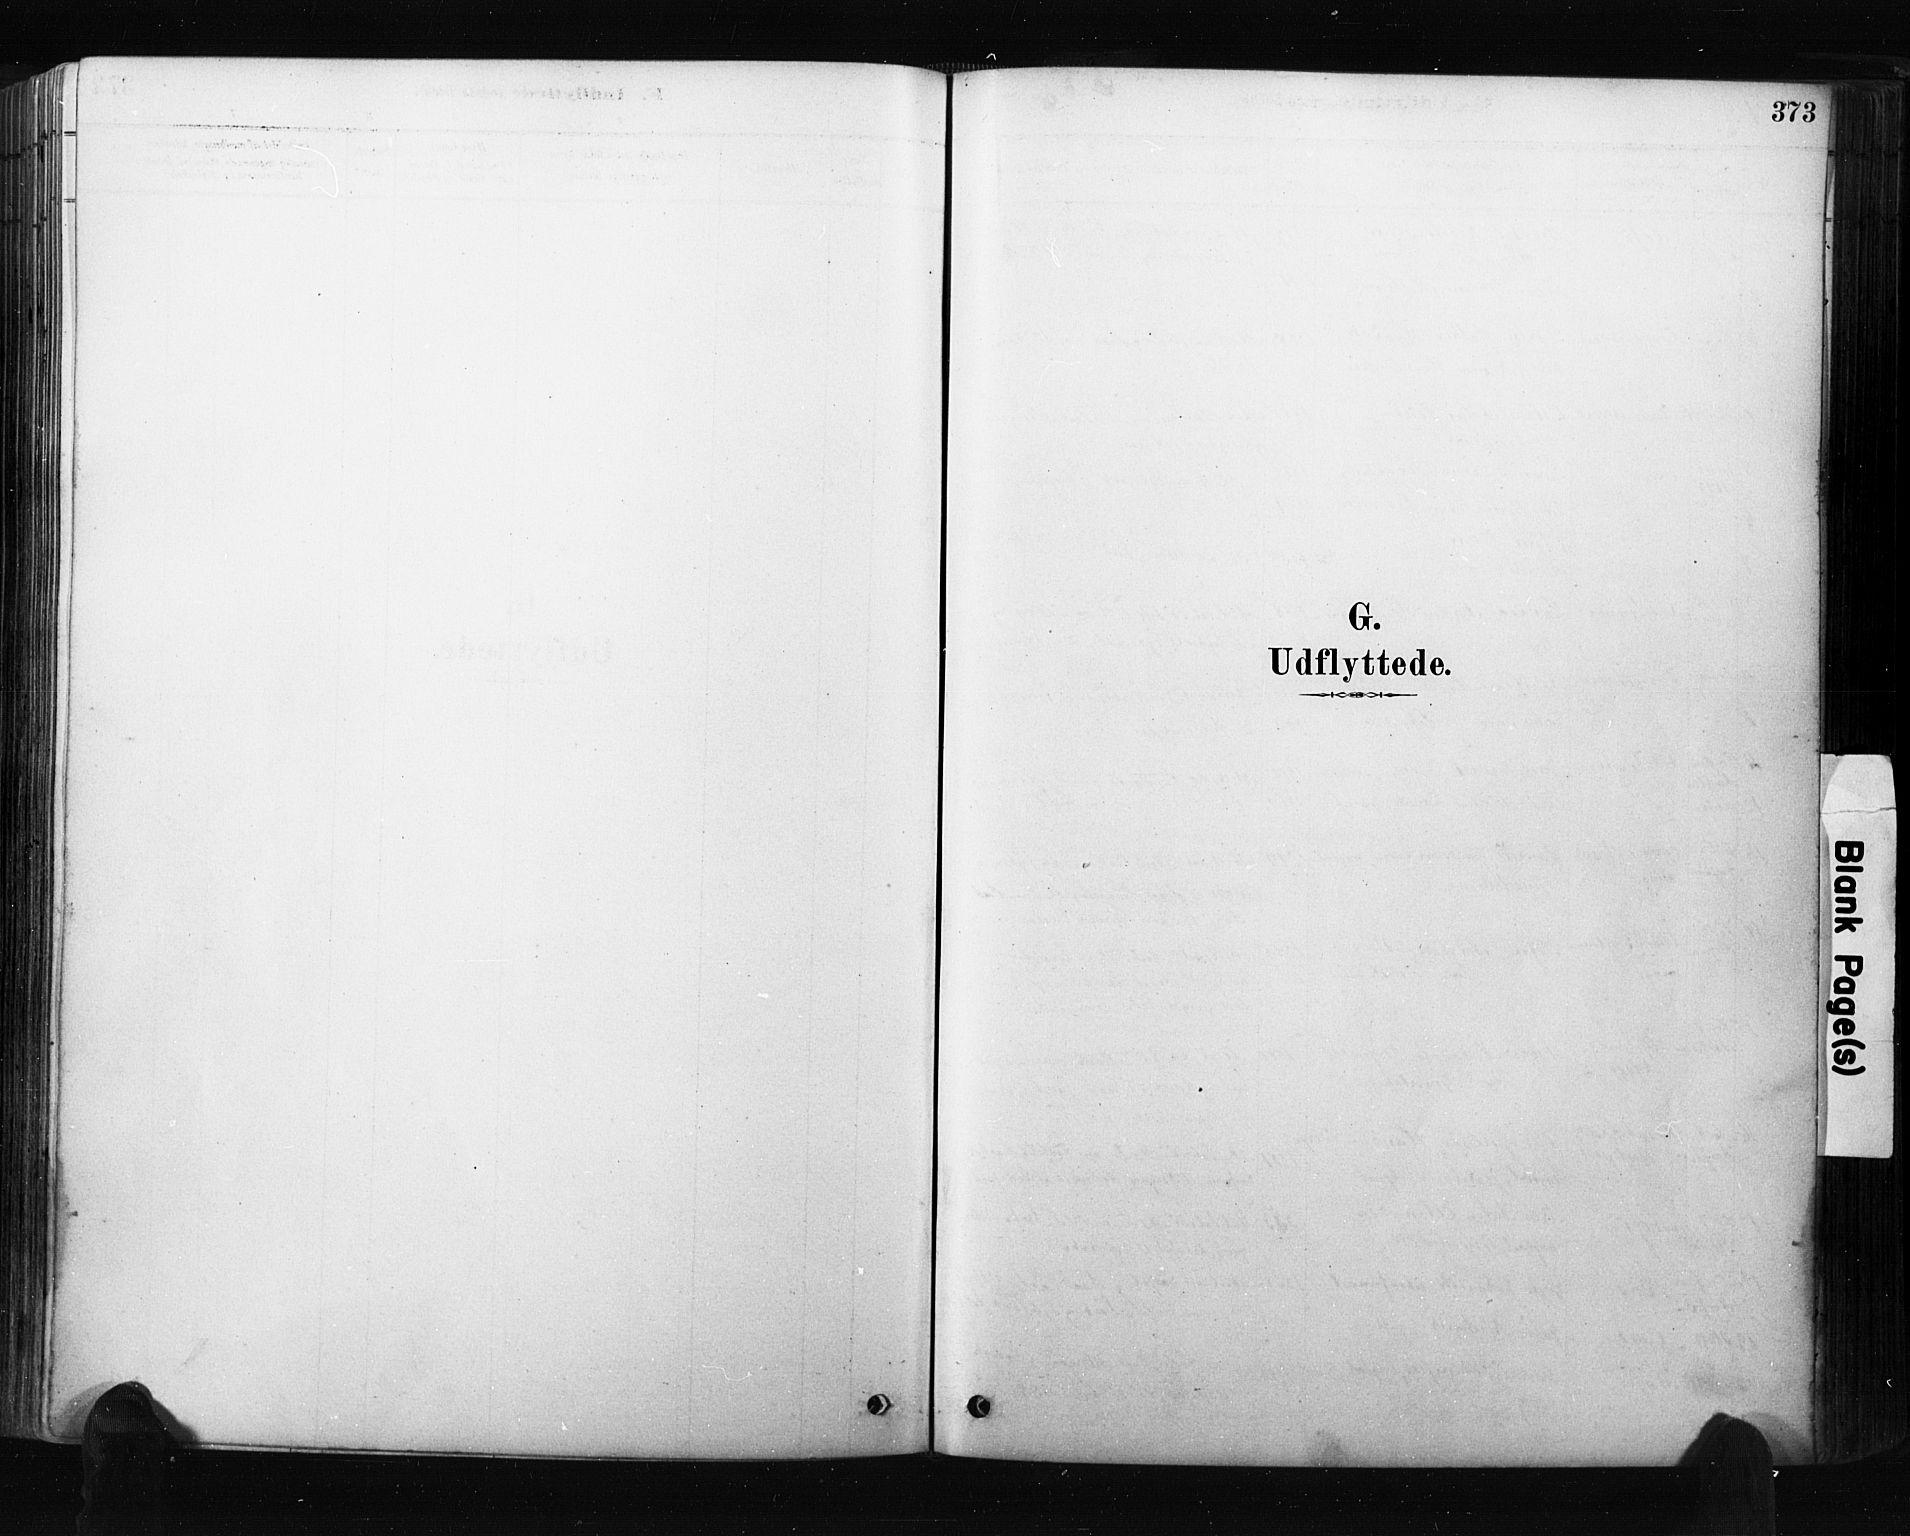 SAO, Råde prestekontor kirkebøker, F/Fa/L0007: Ministerialbok nr. 7, 1878-1902, s. 373